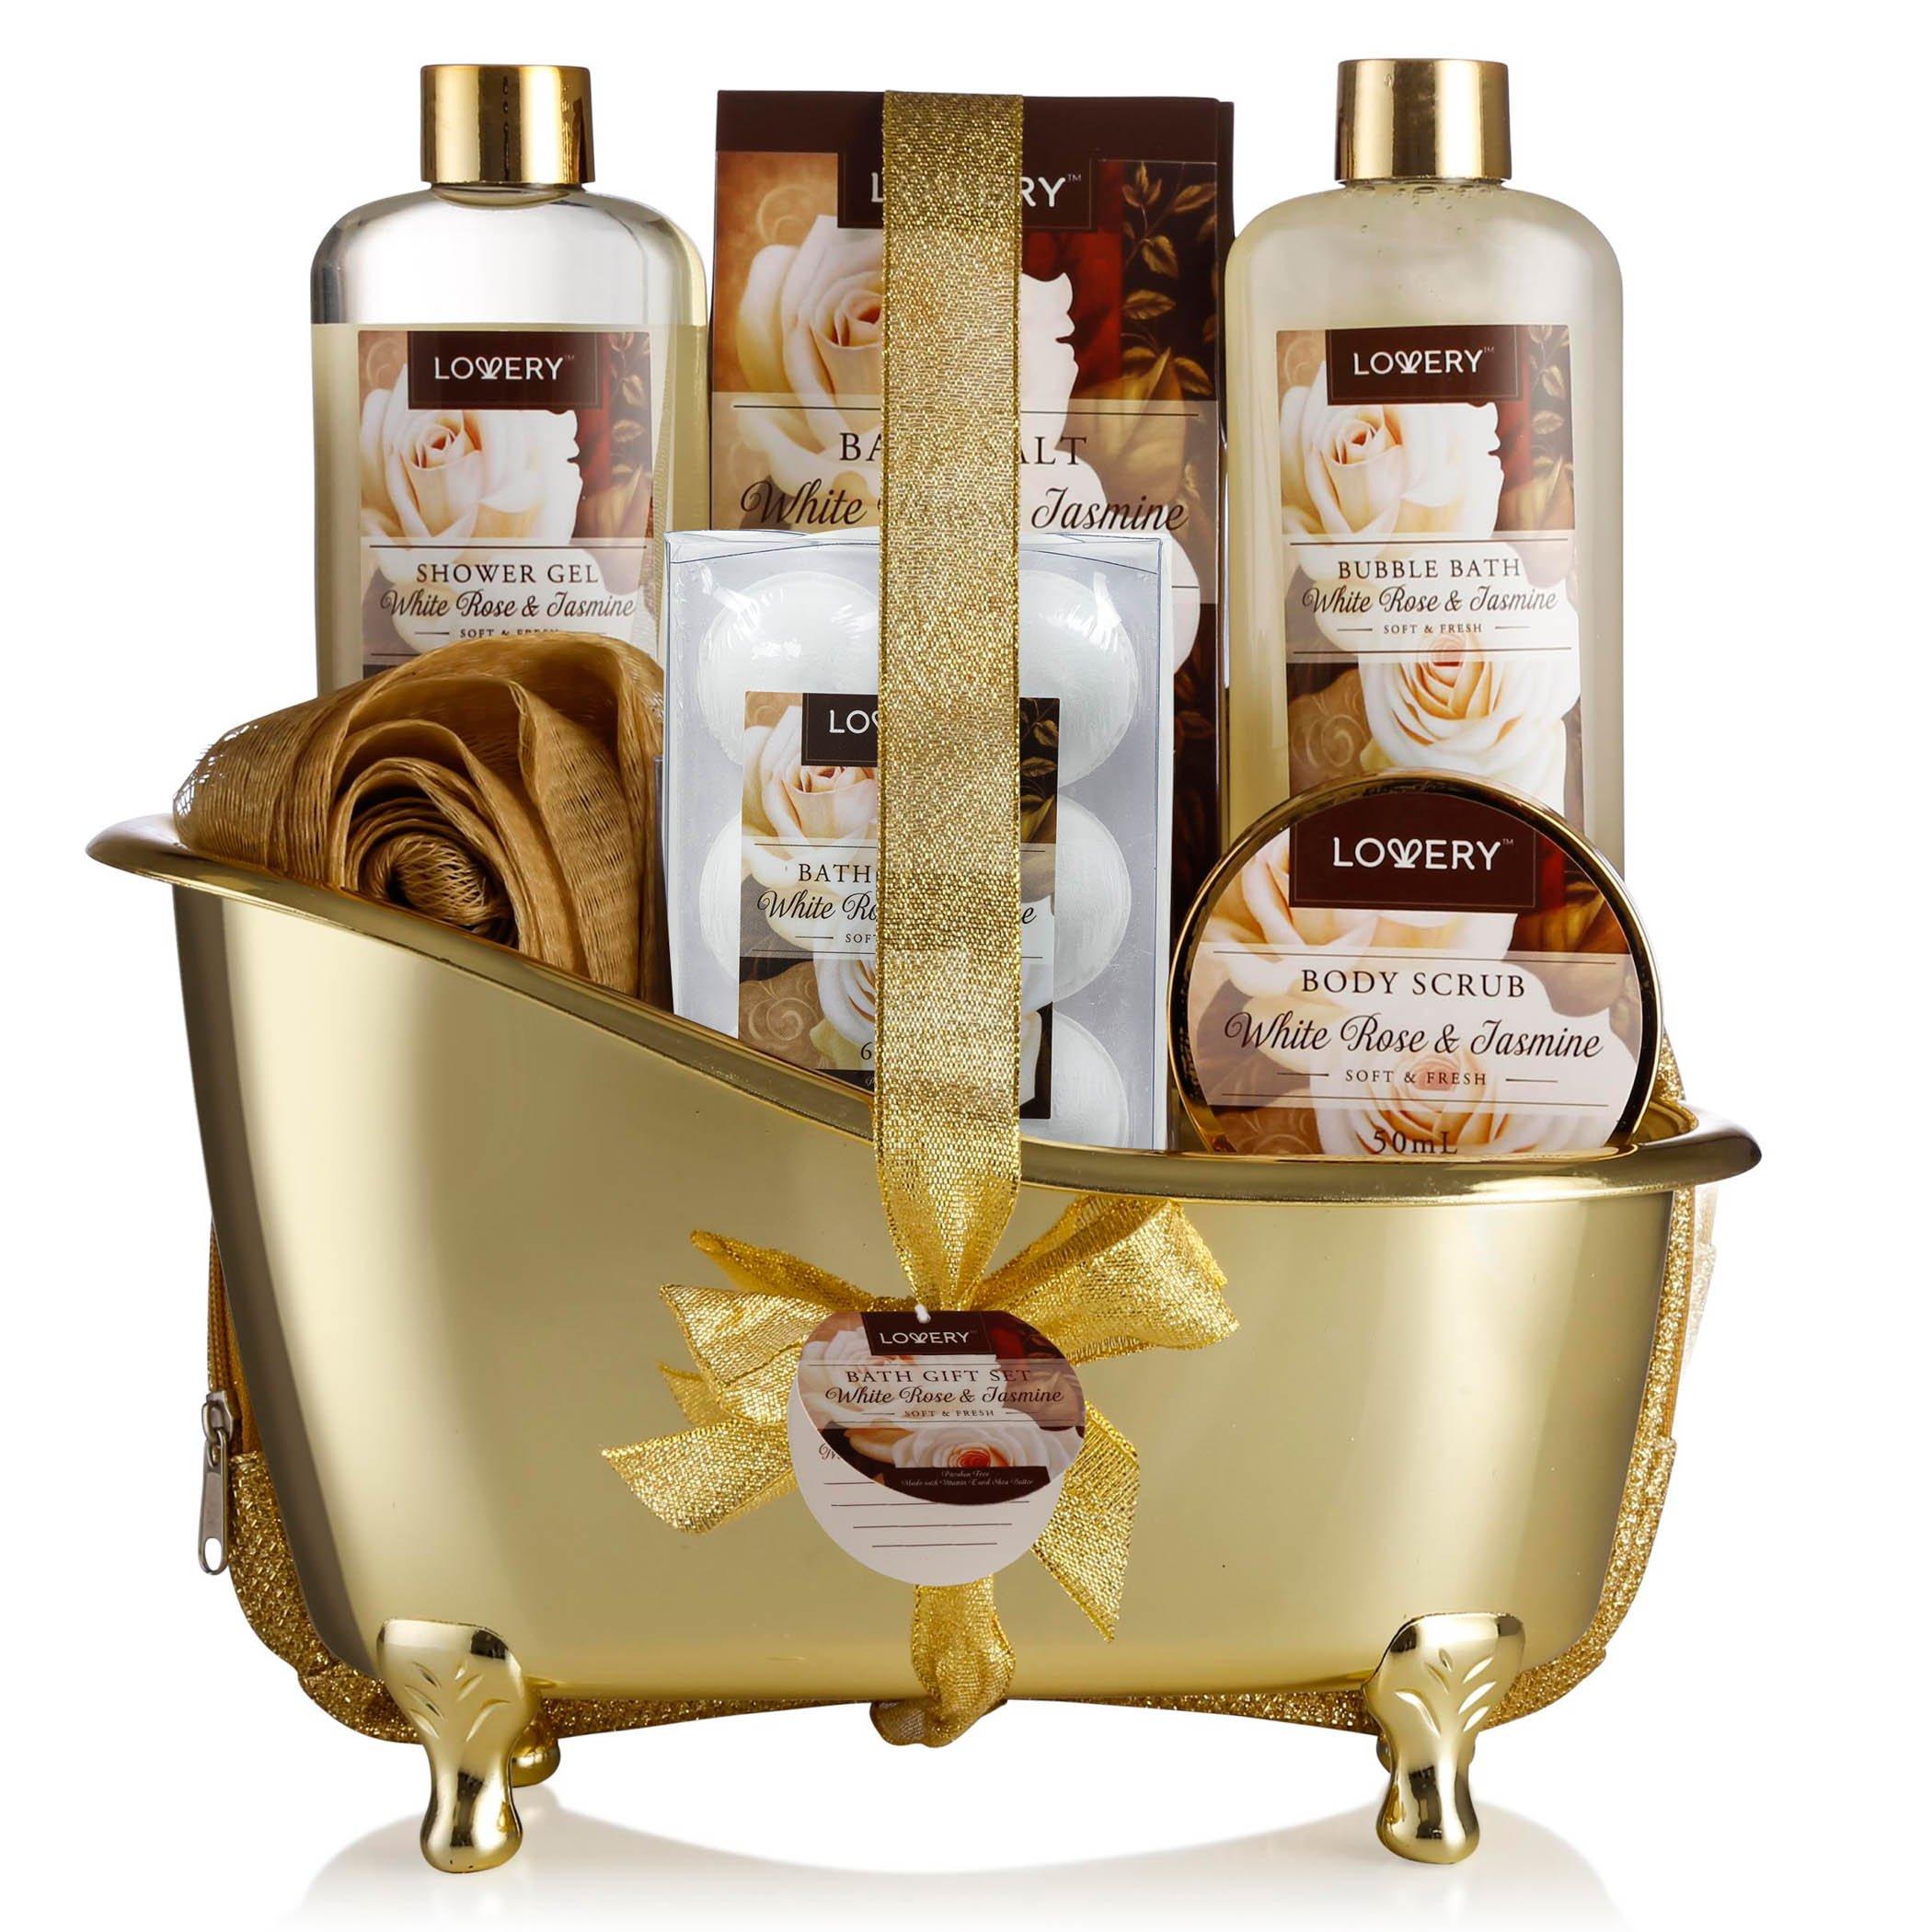 Spa Gift Basket, Luxury 13 Piece Bath & Body Set For Men & Women, White Rose & Jasmine Fragrance - Contains Shower Gel, Bubble Bath, Body Scrub, Bath Salt, 6 Bath Bombs, Pouf, Cosmetic Bag & Gold Tub by LOVERY